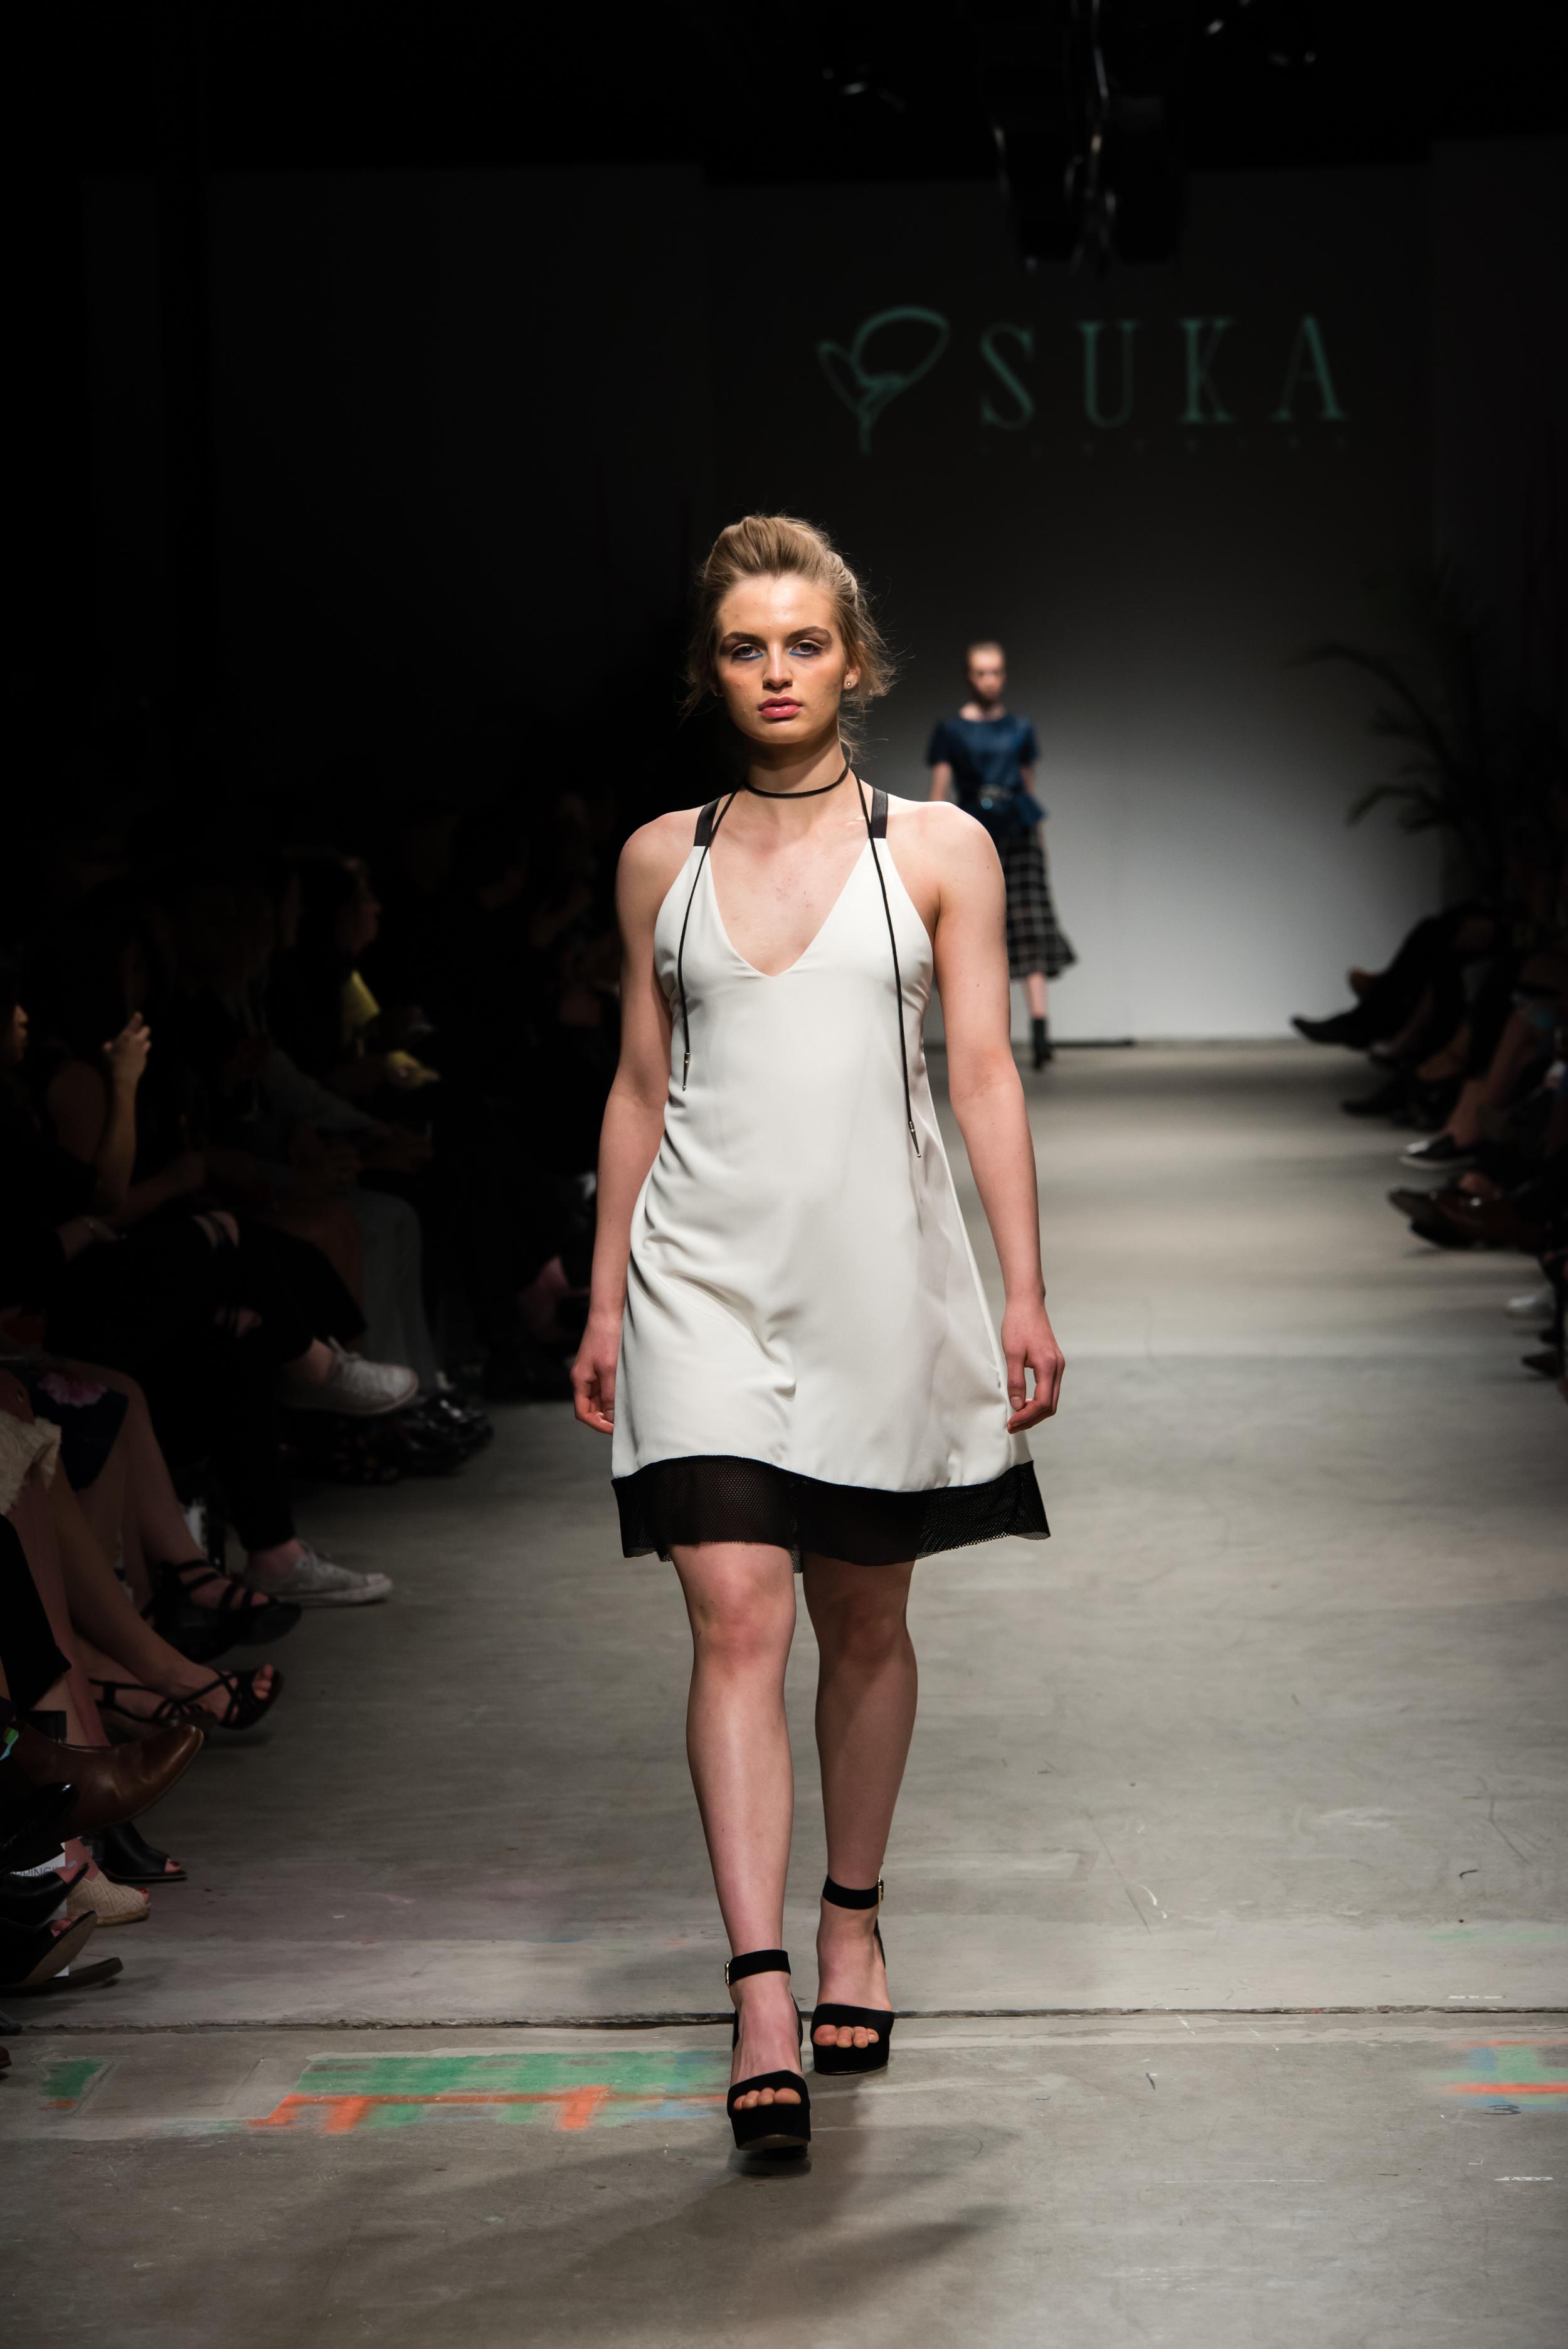 Suka Clothing-Sher Khan Niazi-7429.jpg